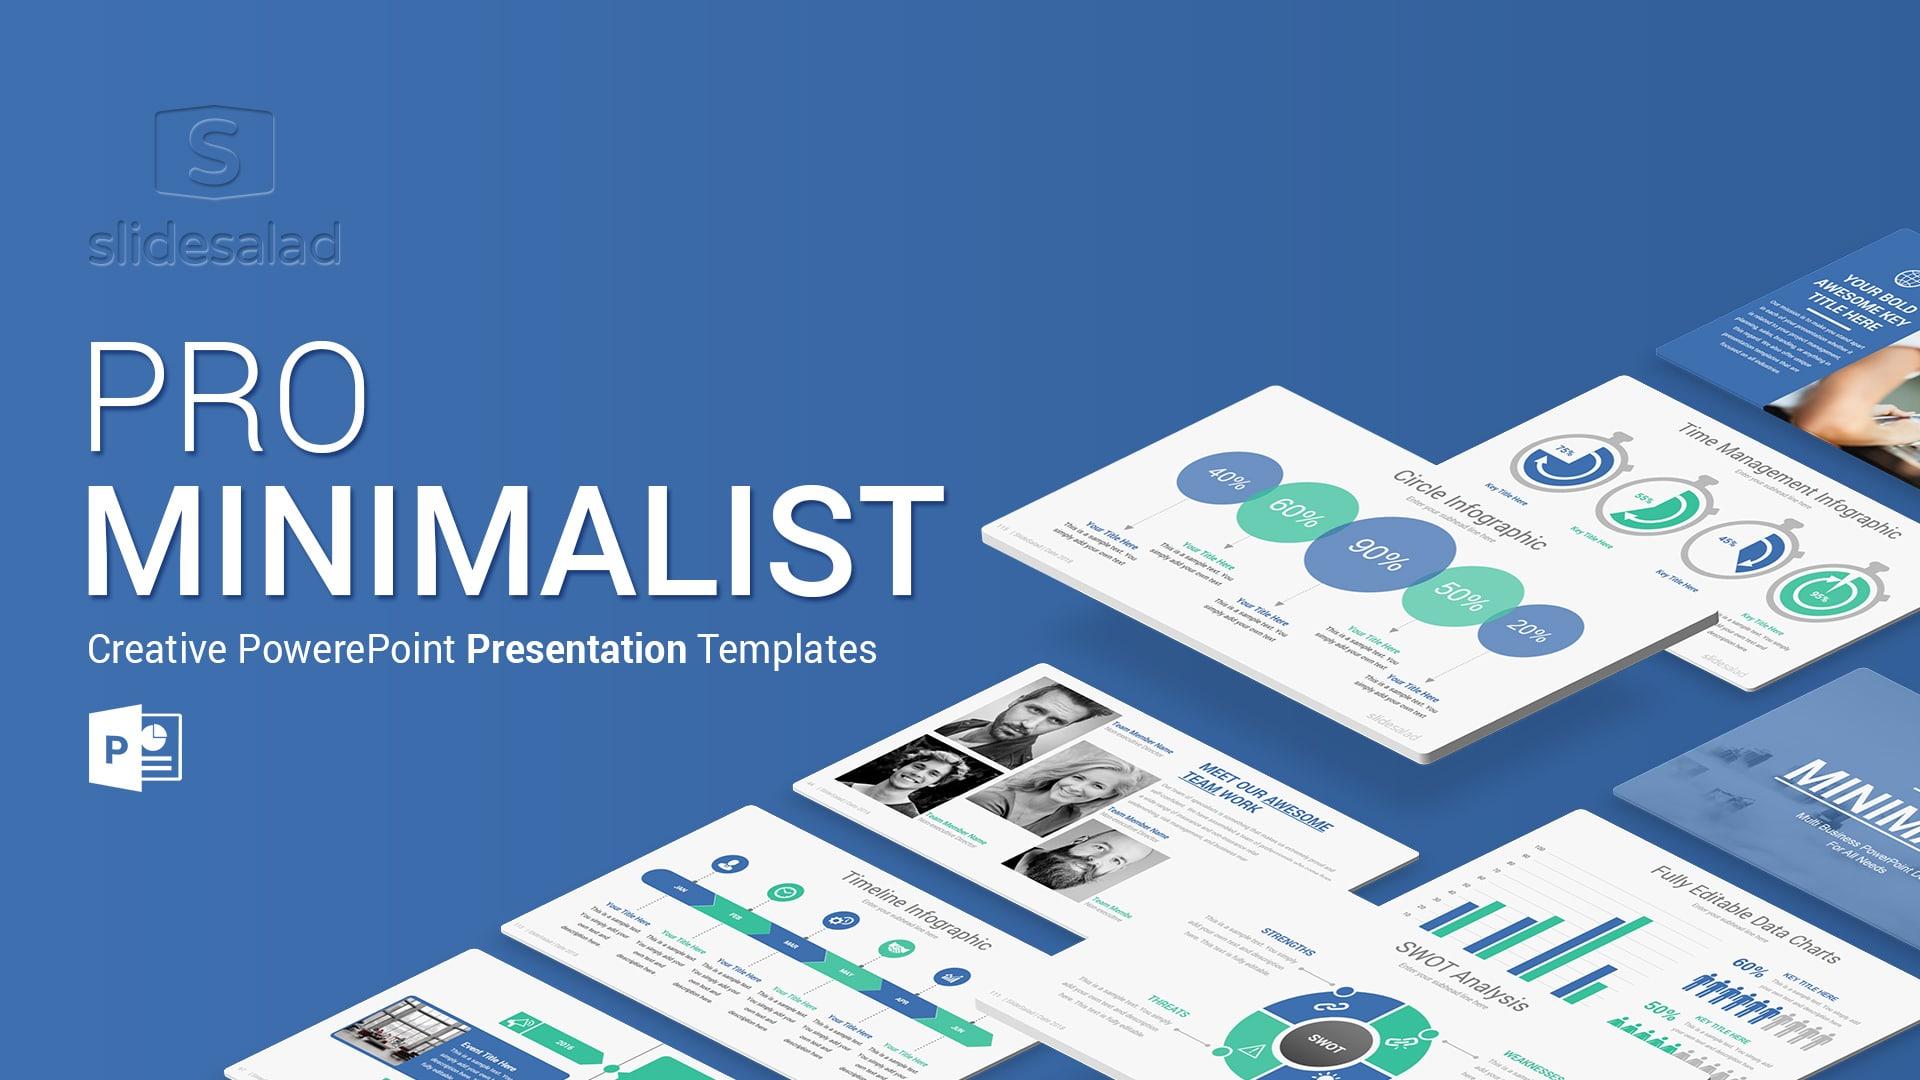 Minimalist PowerPoint Template Designs - Simple PowerPoint PPT Presentation Design